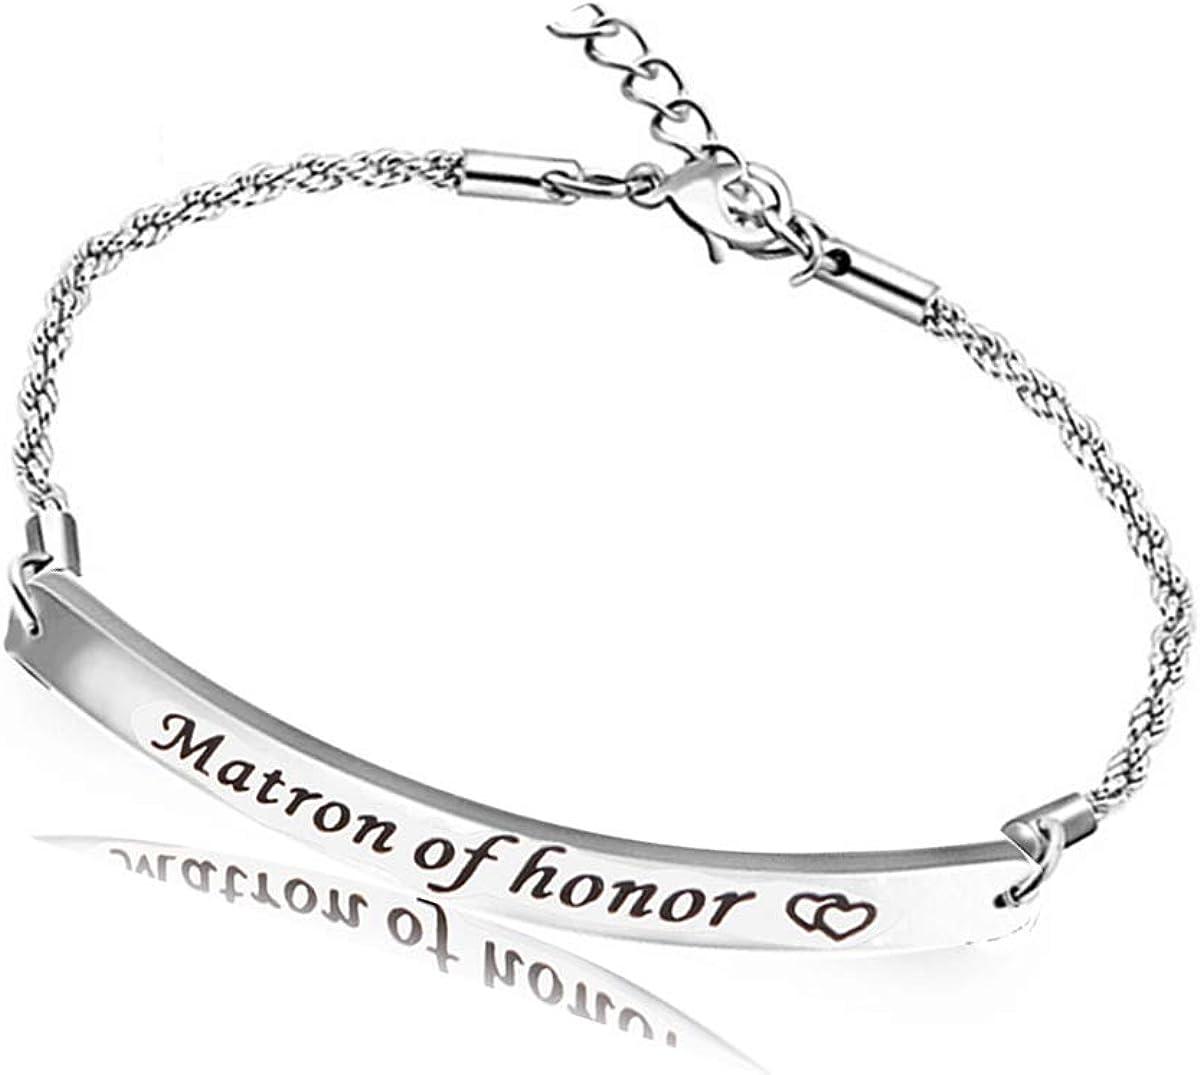 REEBOOO Matron of Honor Gift Matron of Honor Jewellery Bridesmaid Bracelet